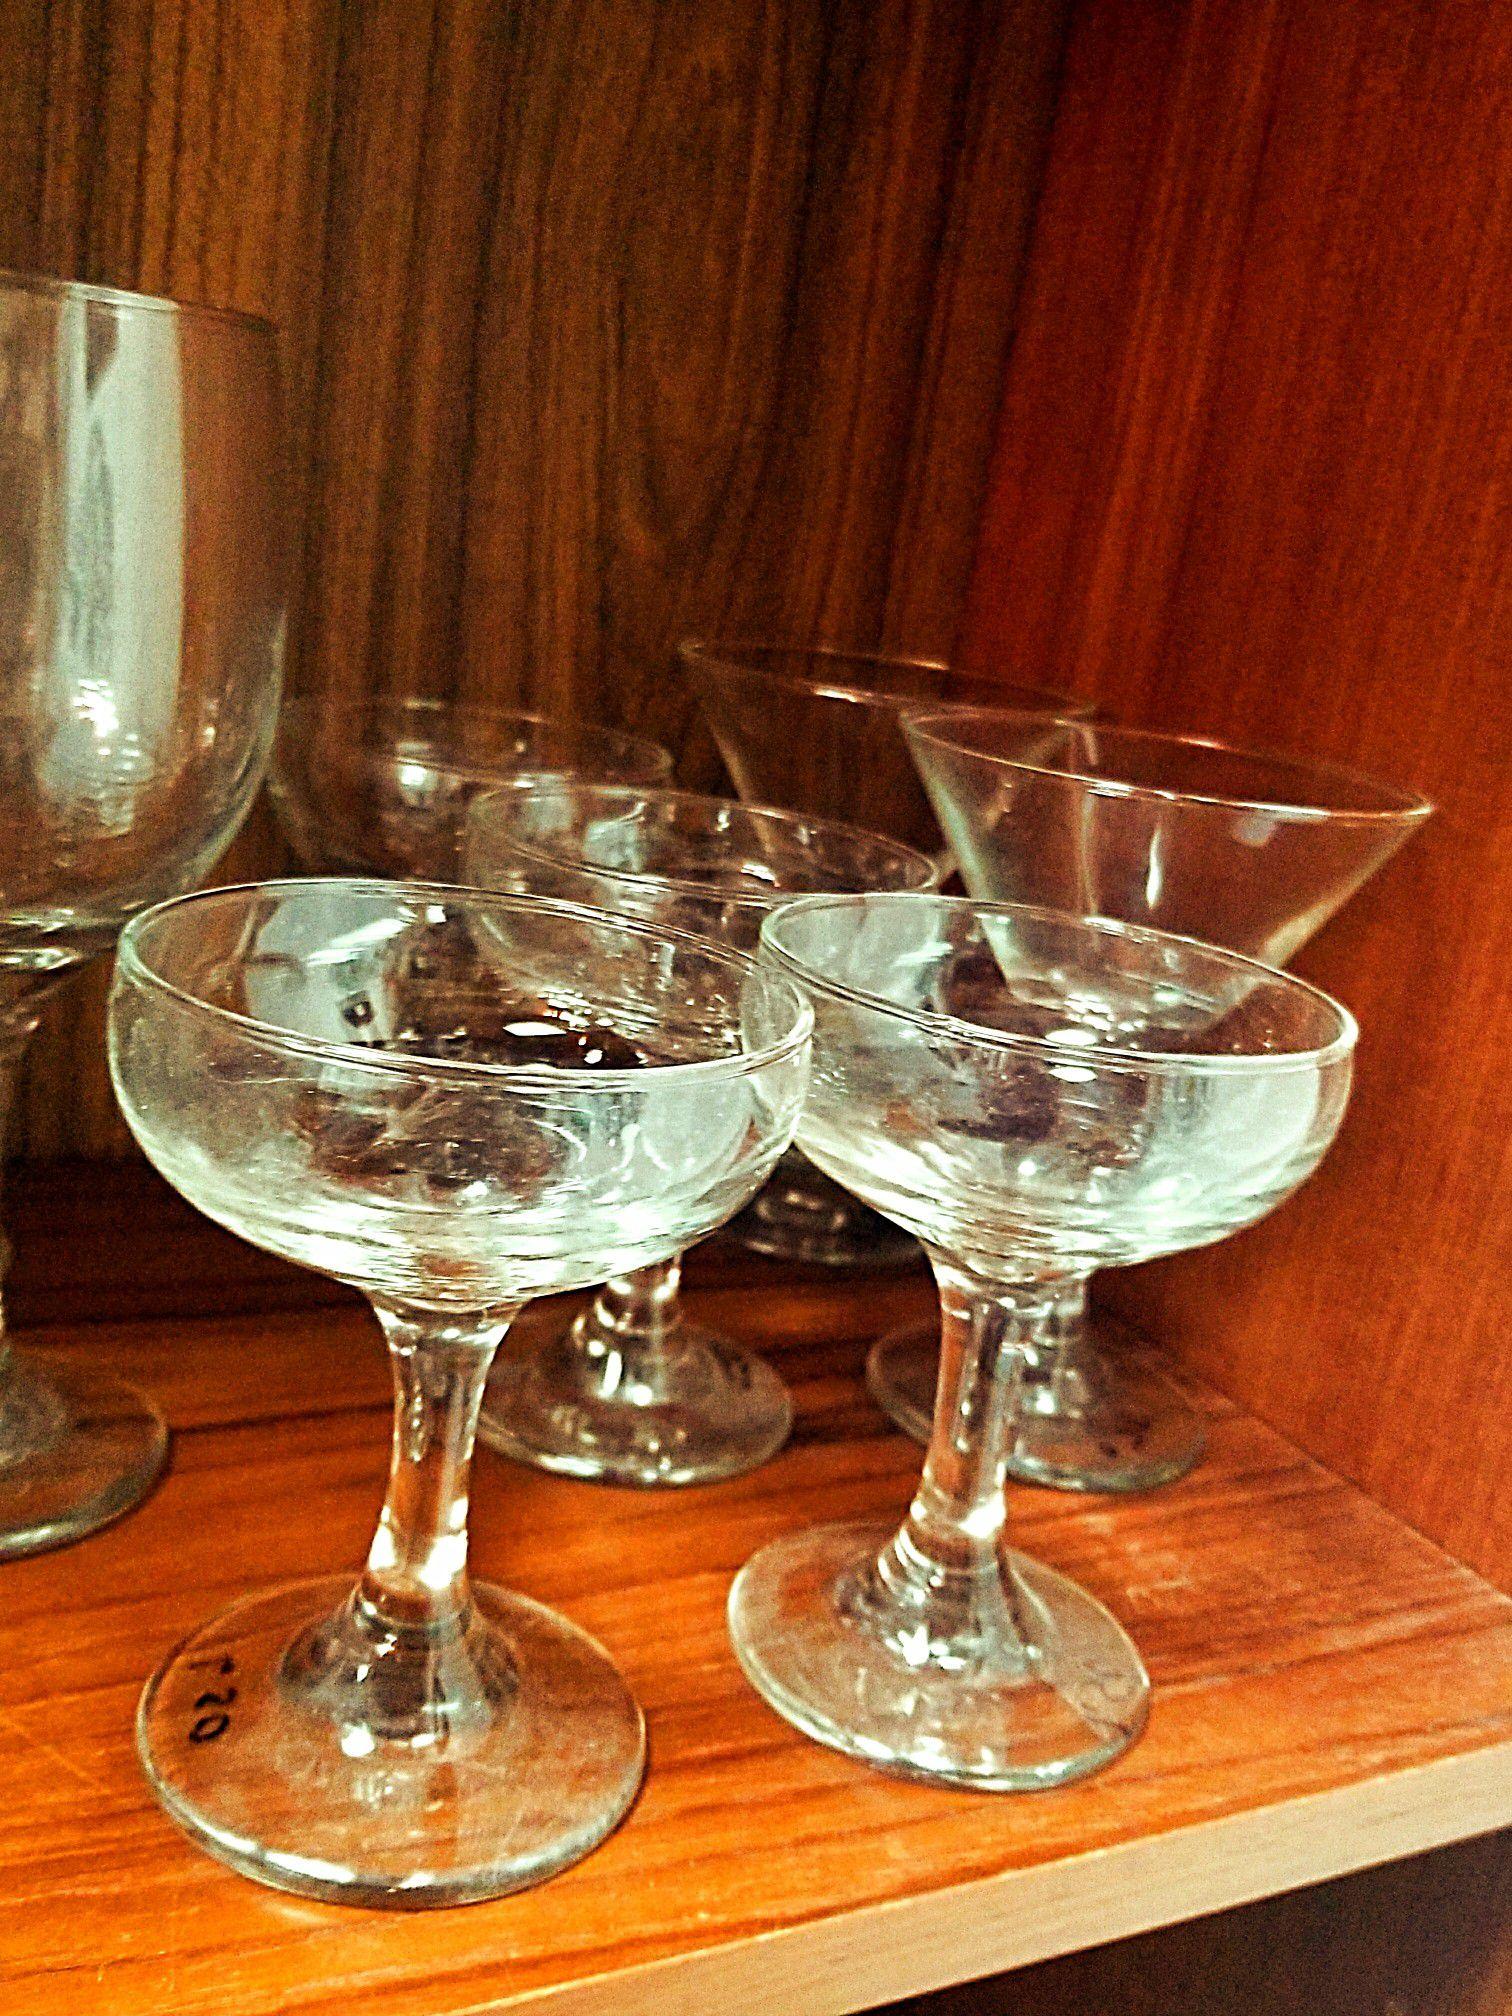 Glasses vases etc